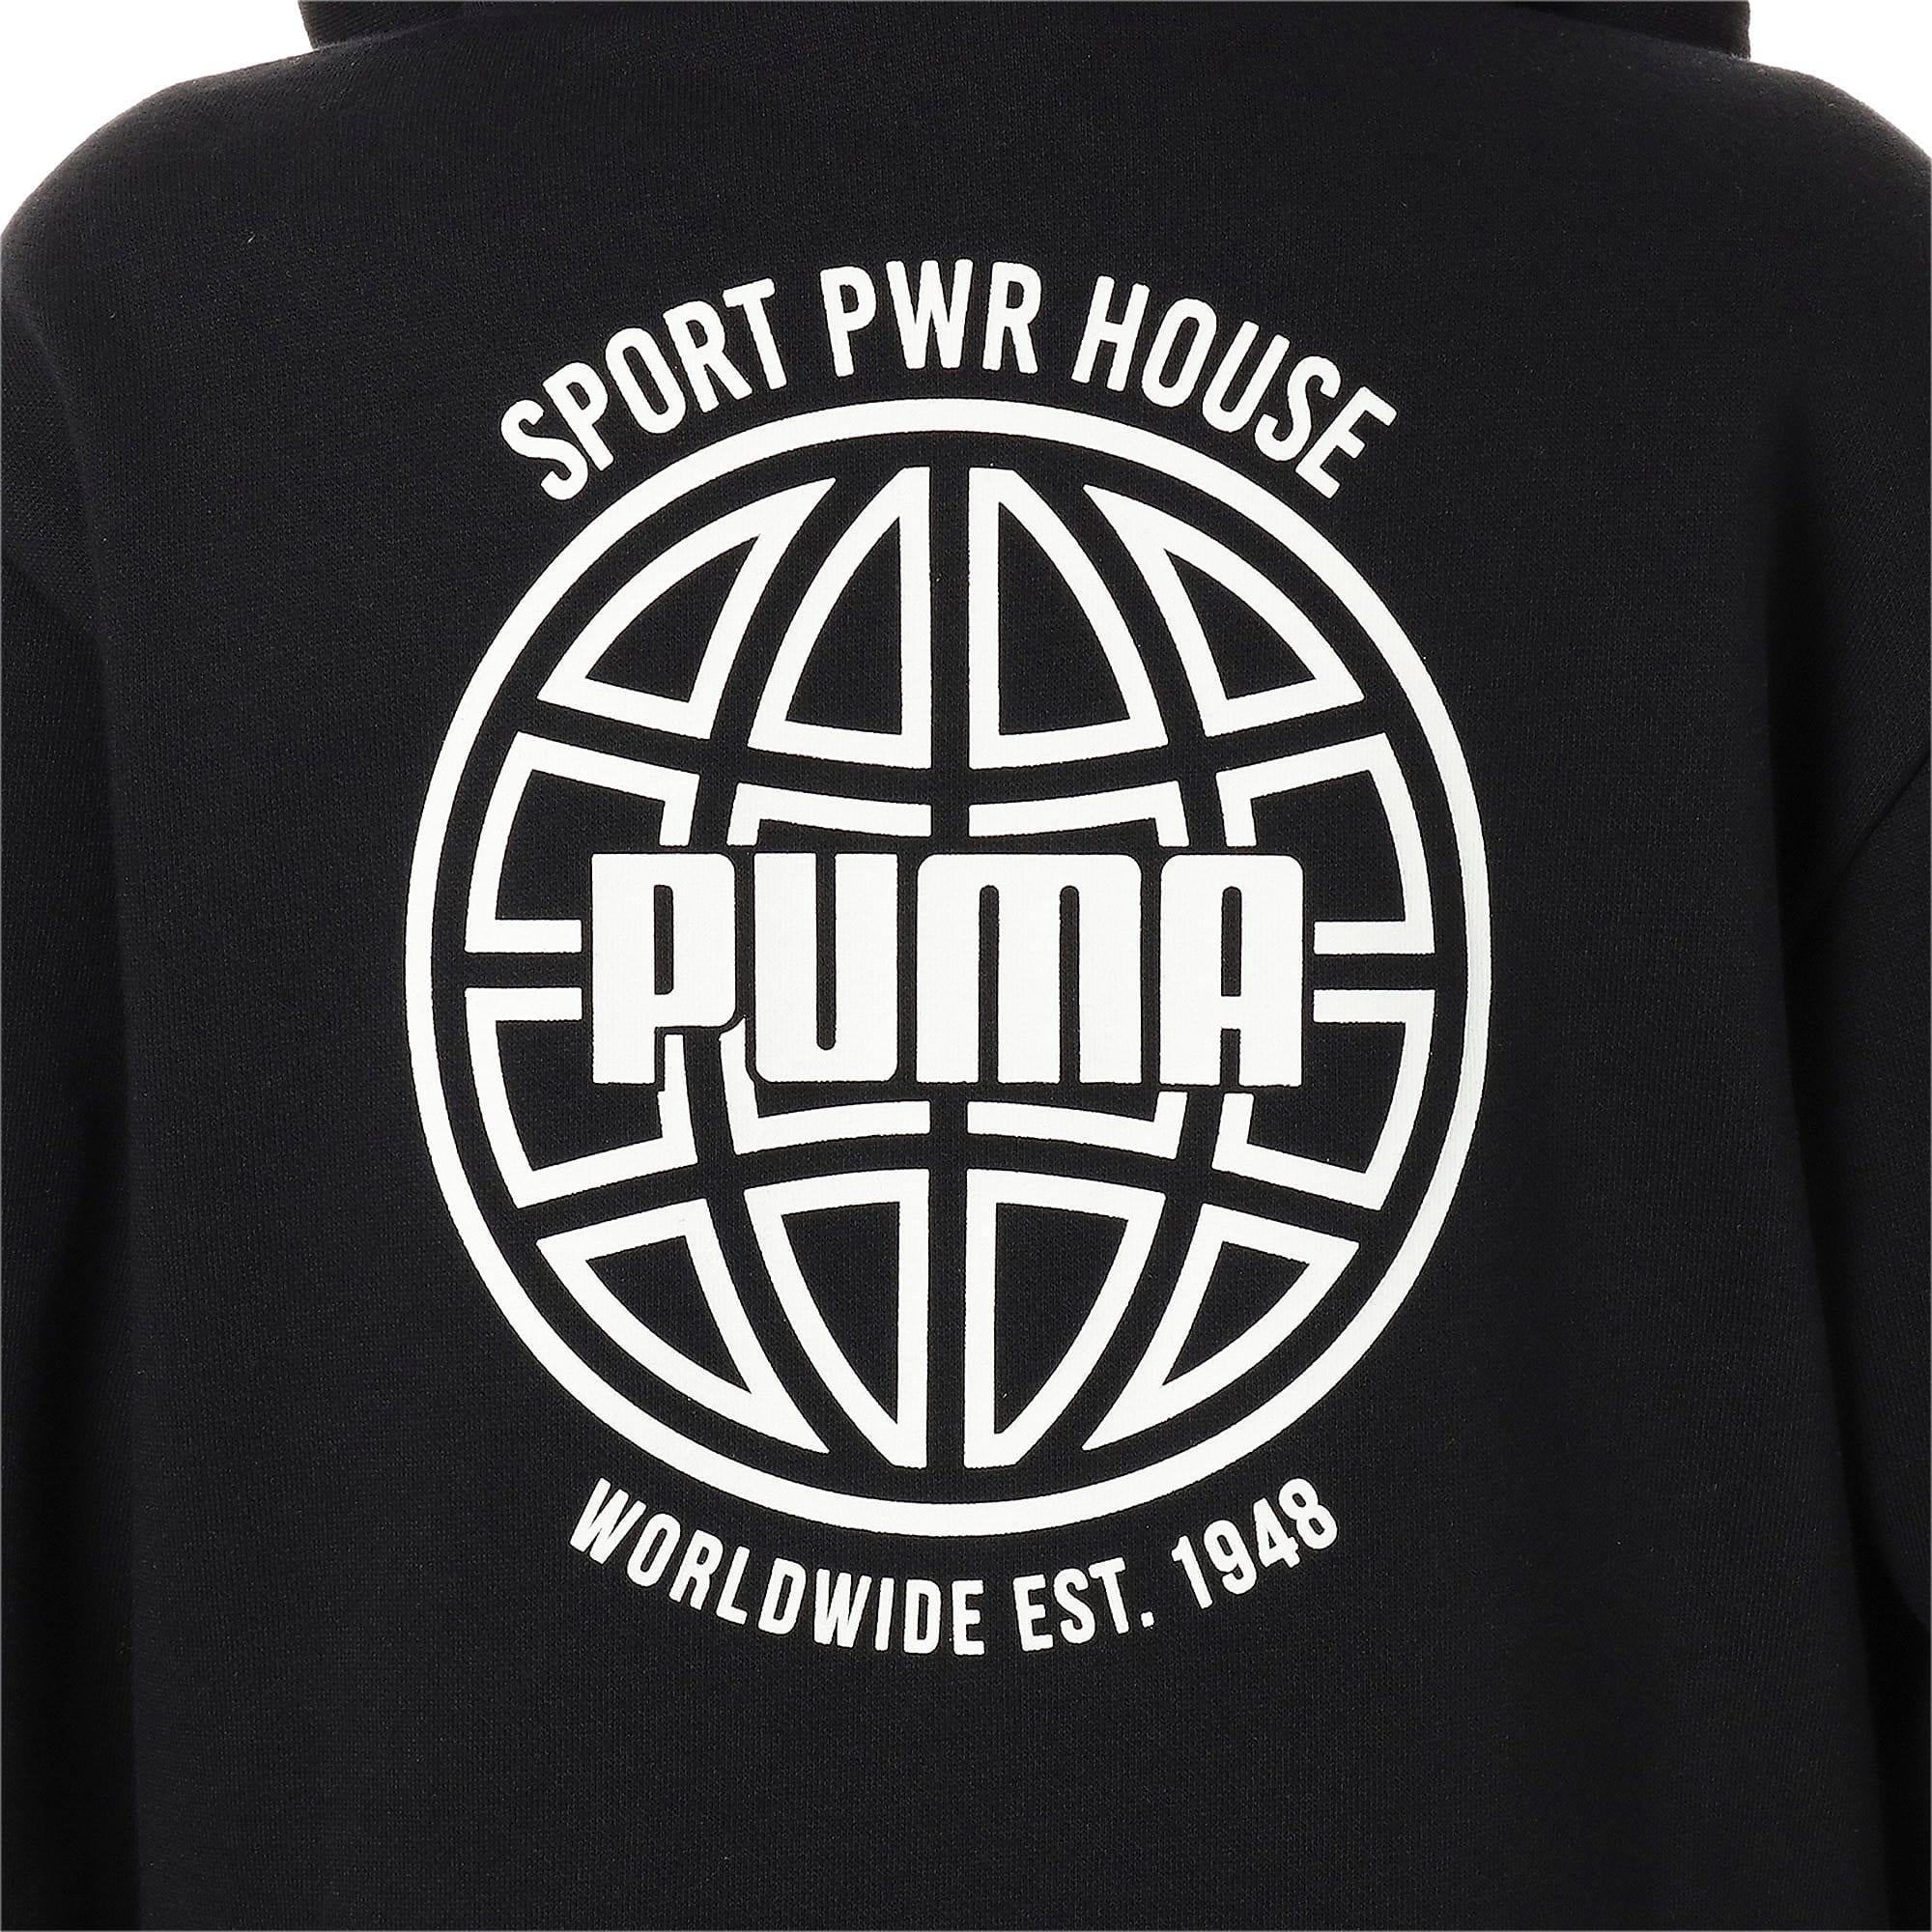 Thumbnail 9 of キッズ アルファ グラフィック フルジップ FL, Puma Black, medium-JPN